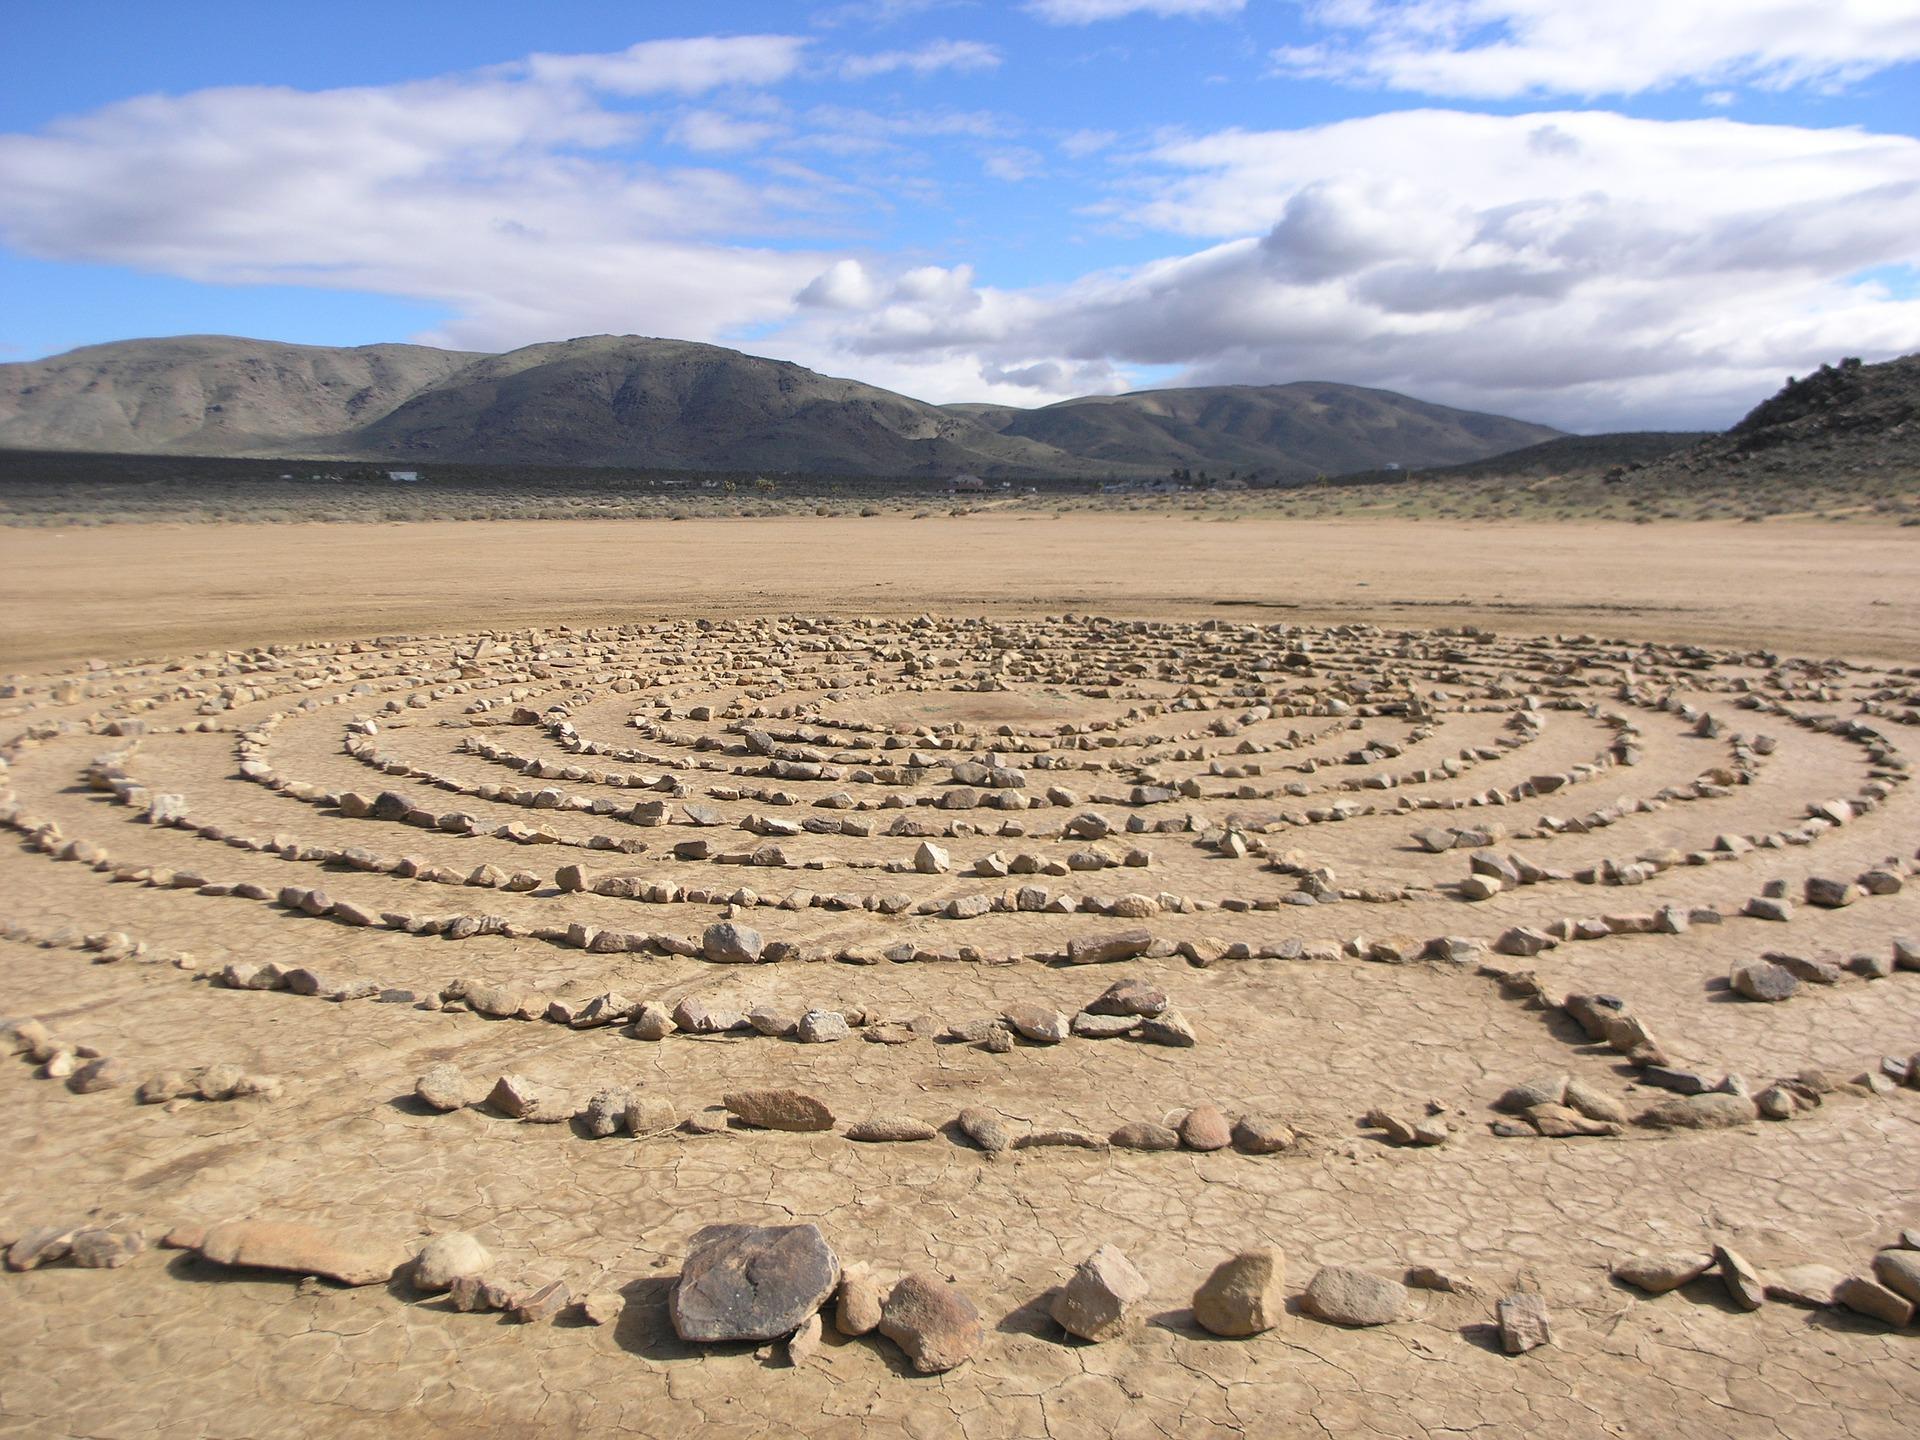 Kiva | ritual ground – verschoben, neuer Termin folgt